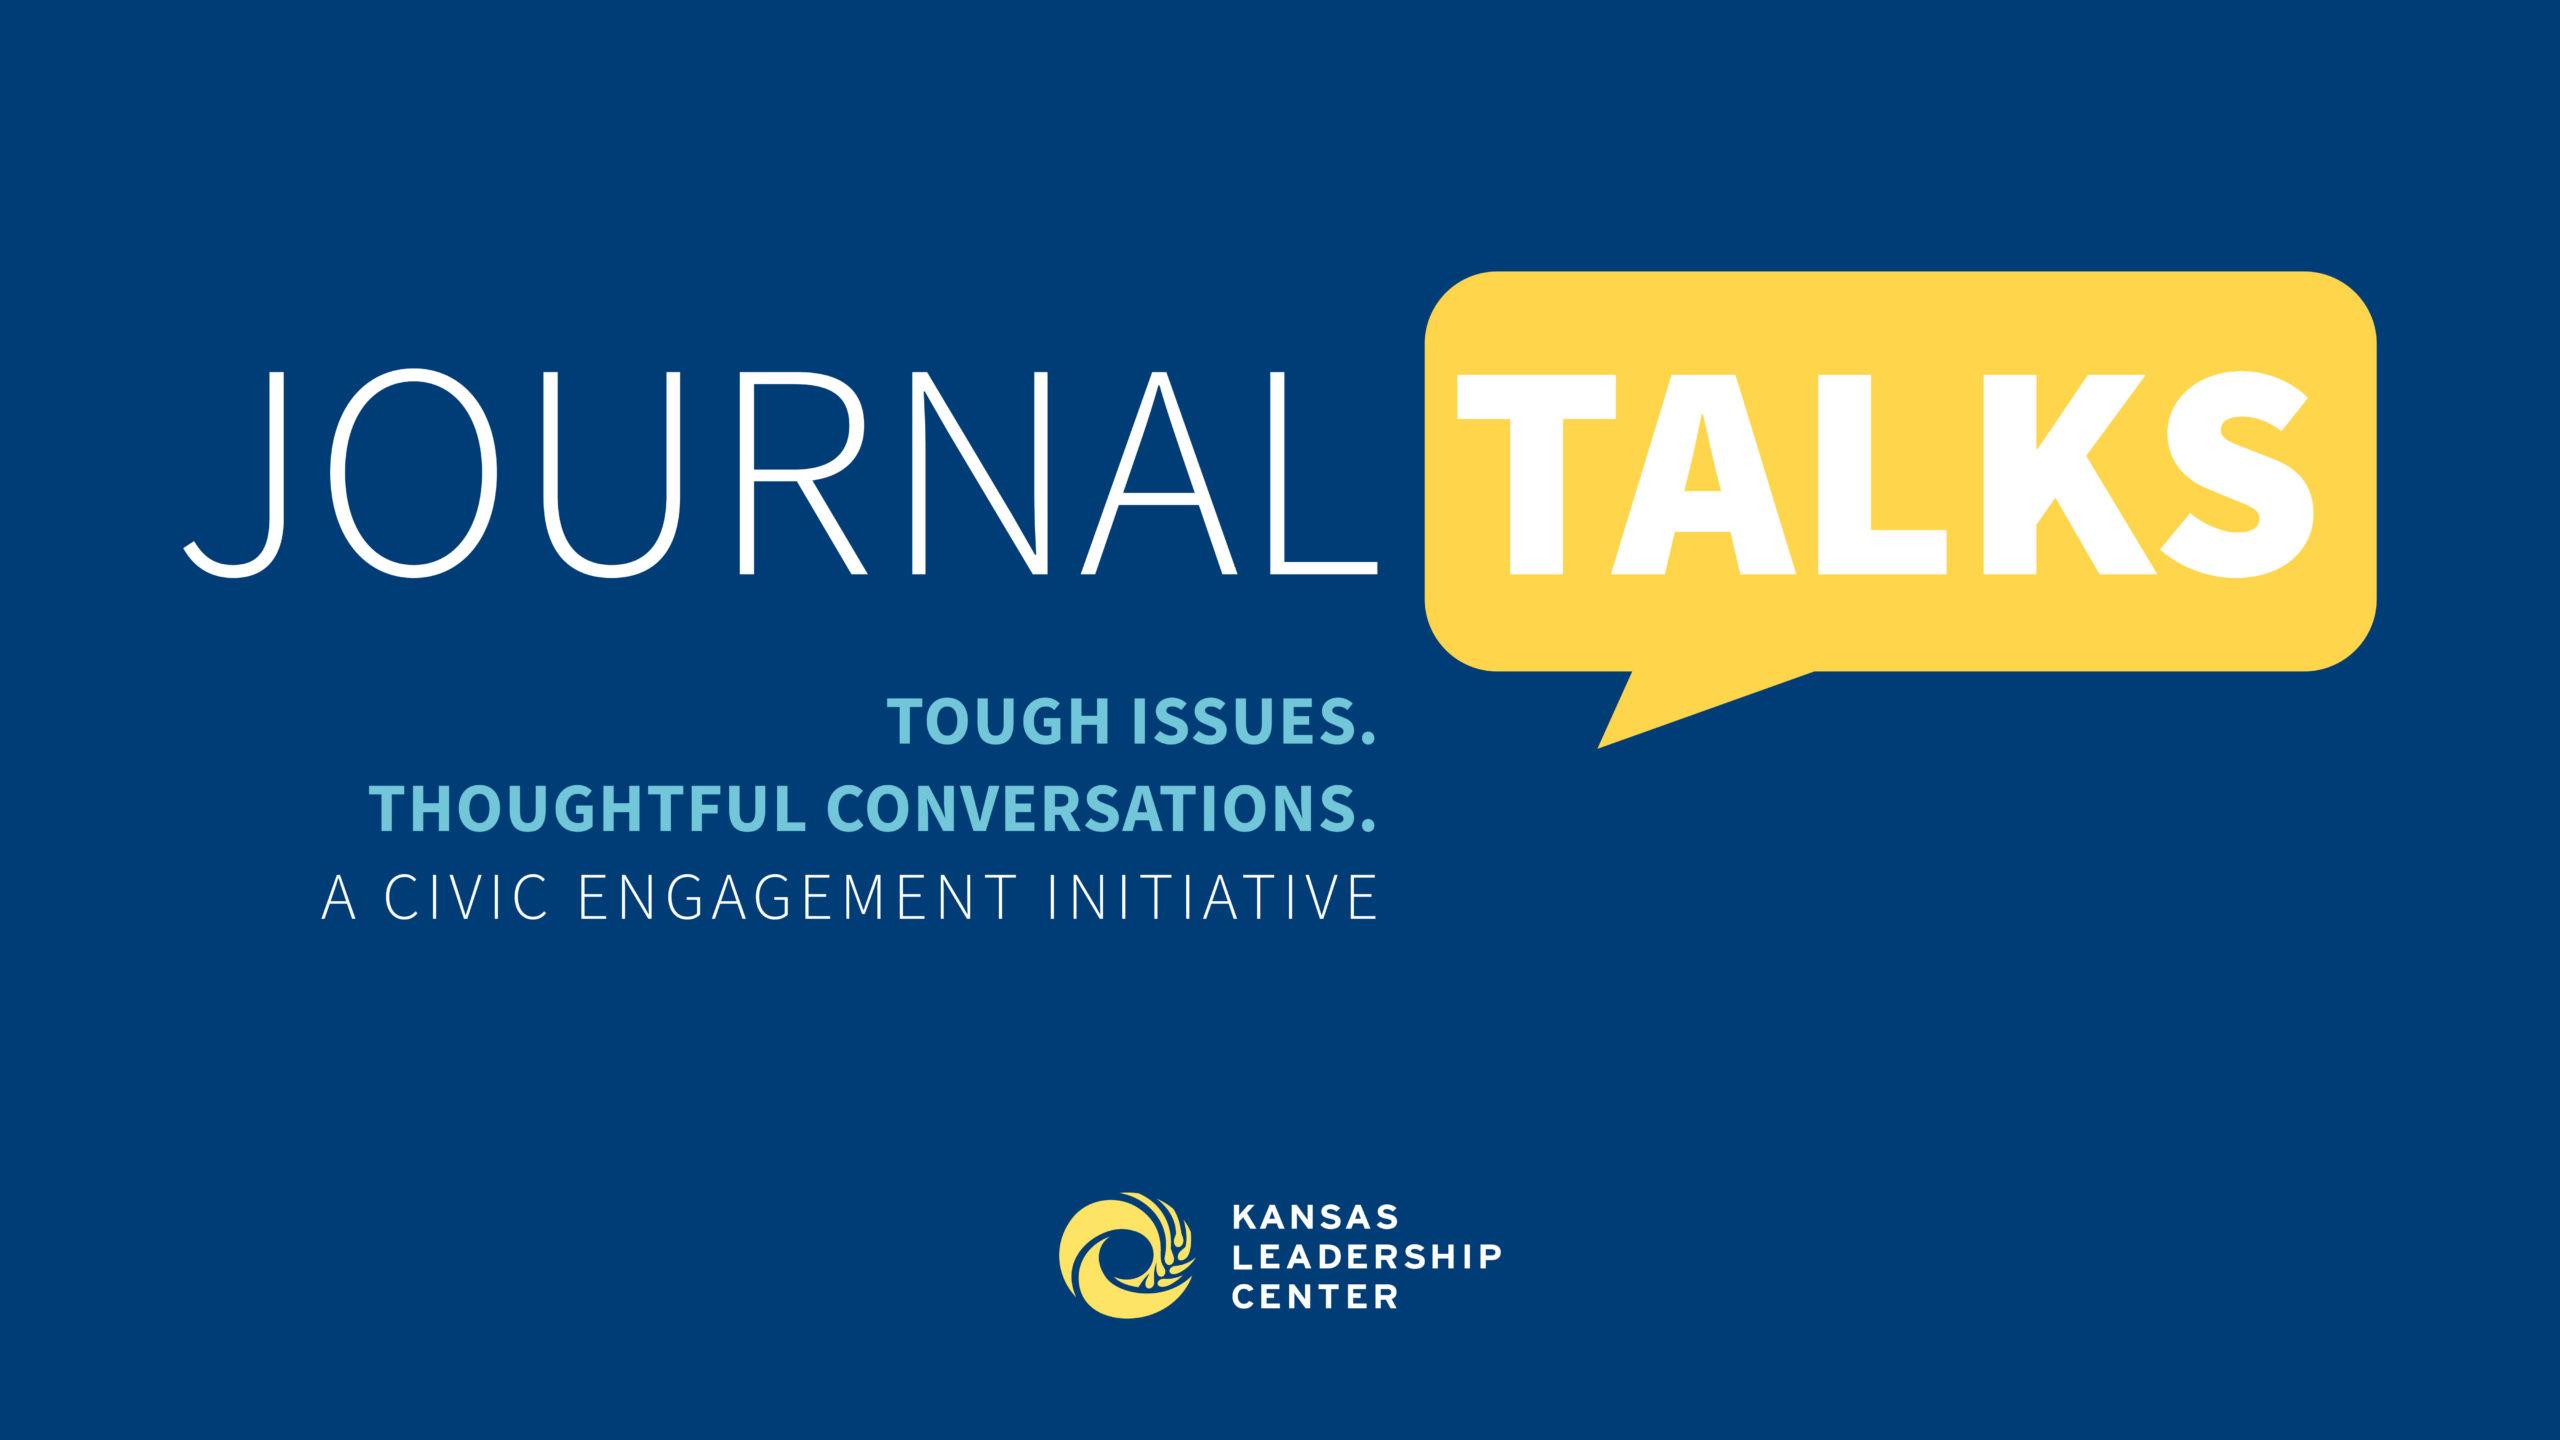 Journal Talks